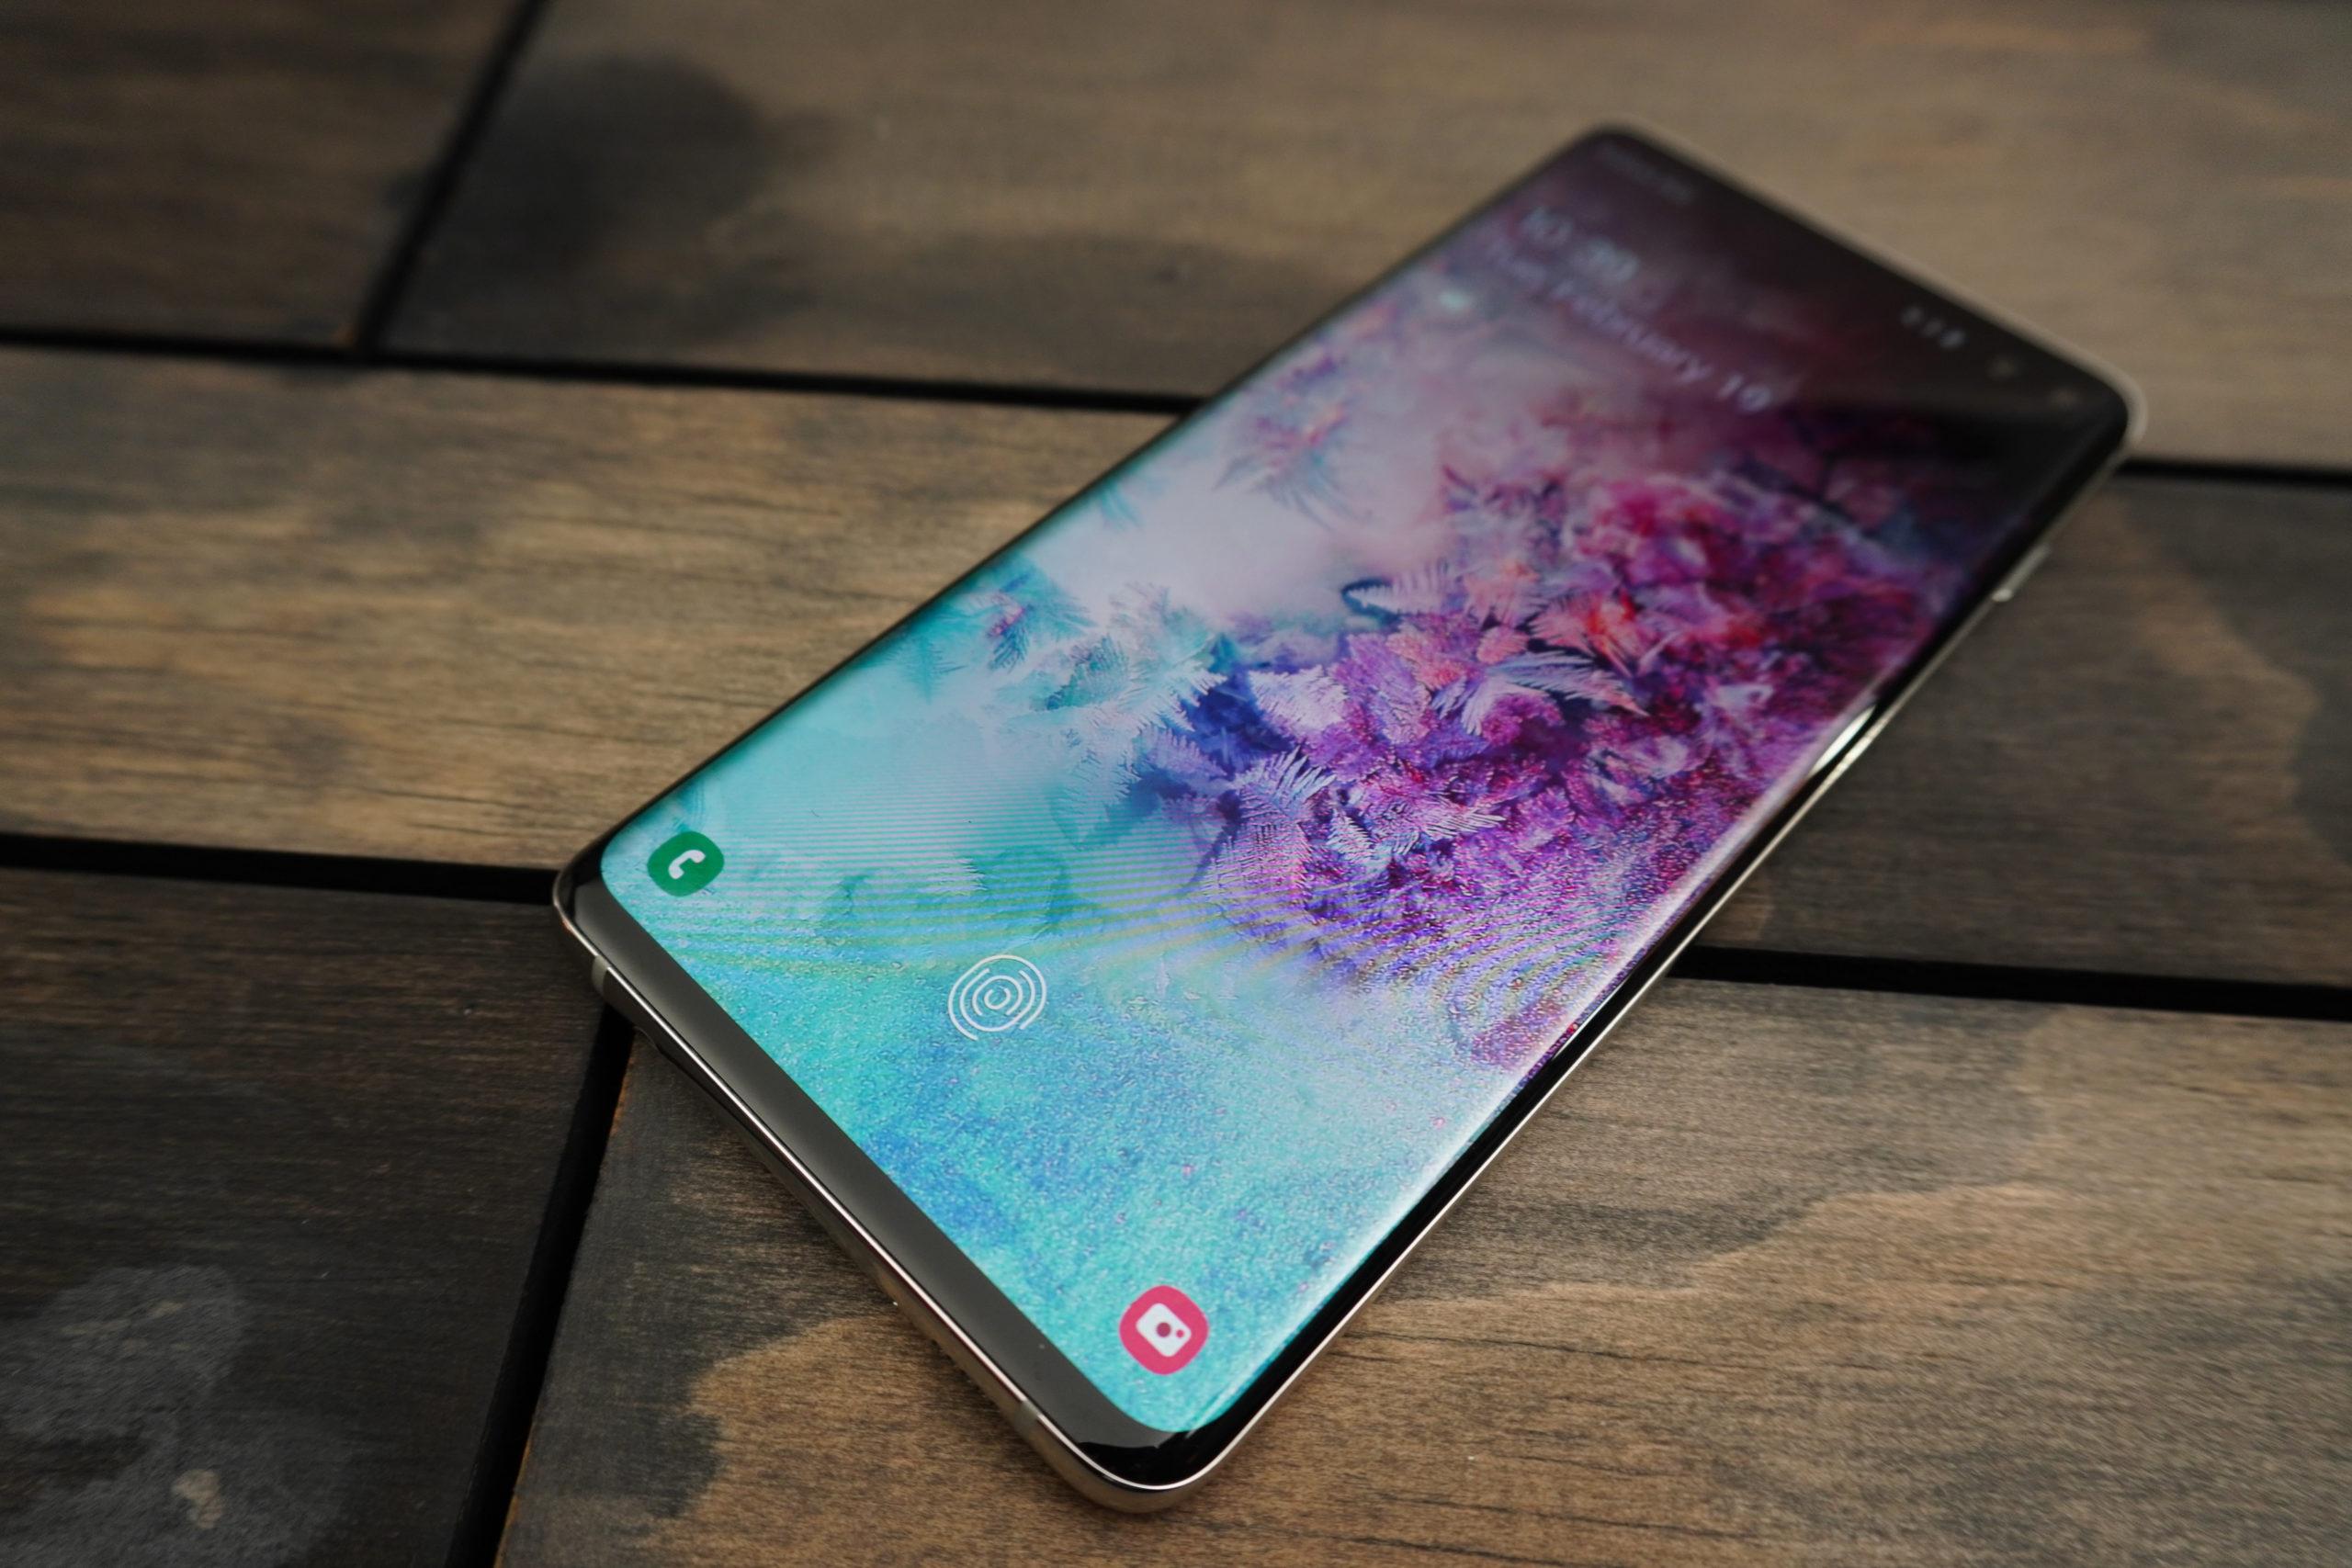 Samsung Galaxy S10 phone on 45 degree angle